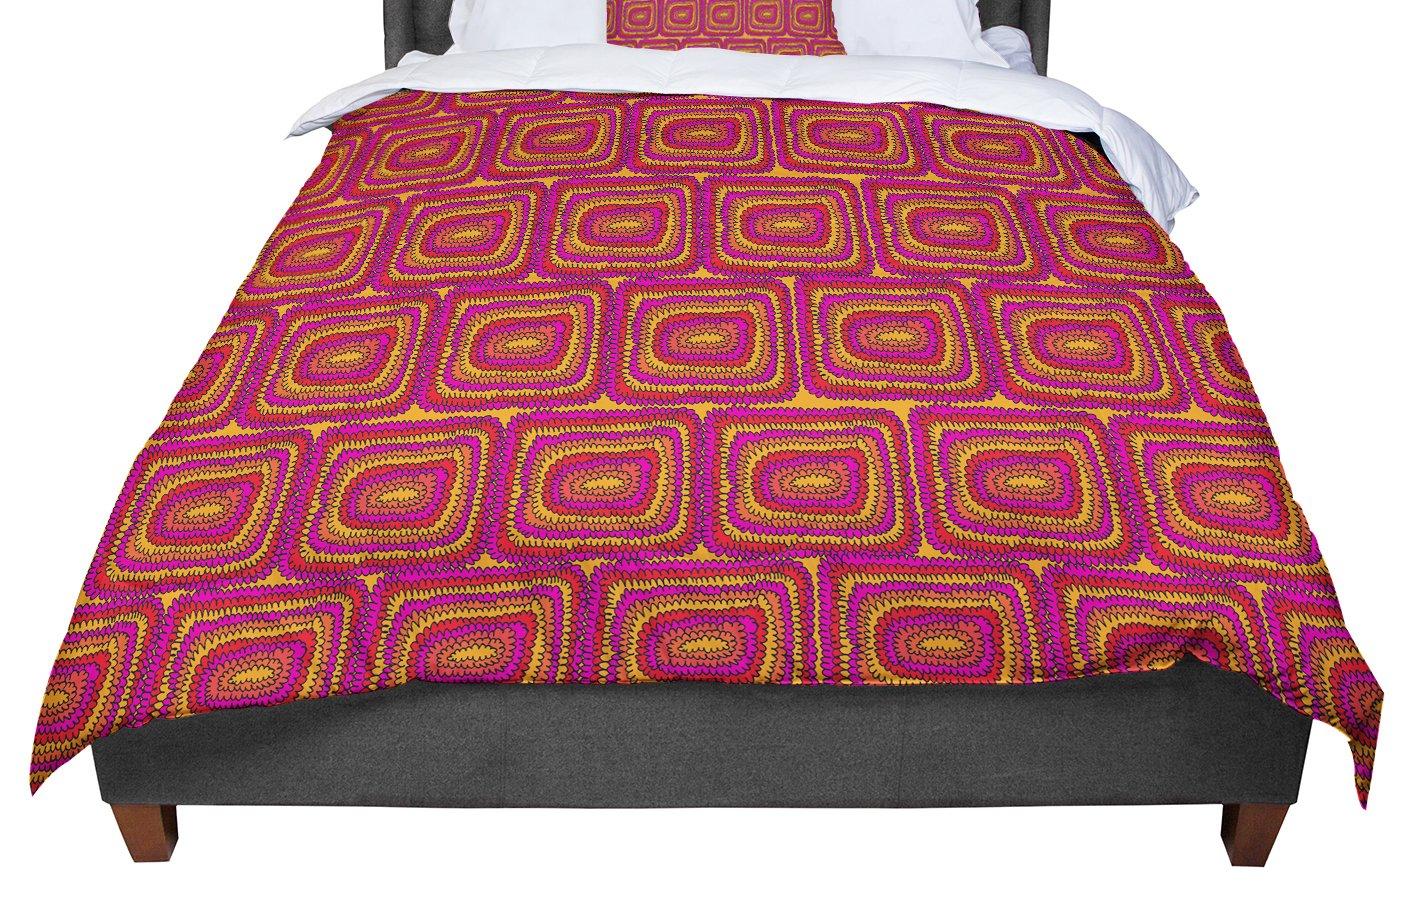 68 X 88 KESS InHouse Nandita Singh Decorative Motif Pink Bronze Floral Twin Comforter